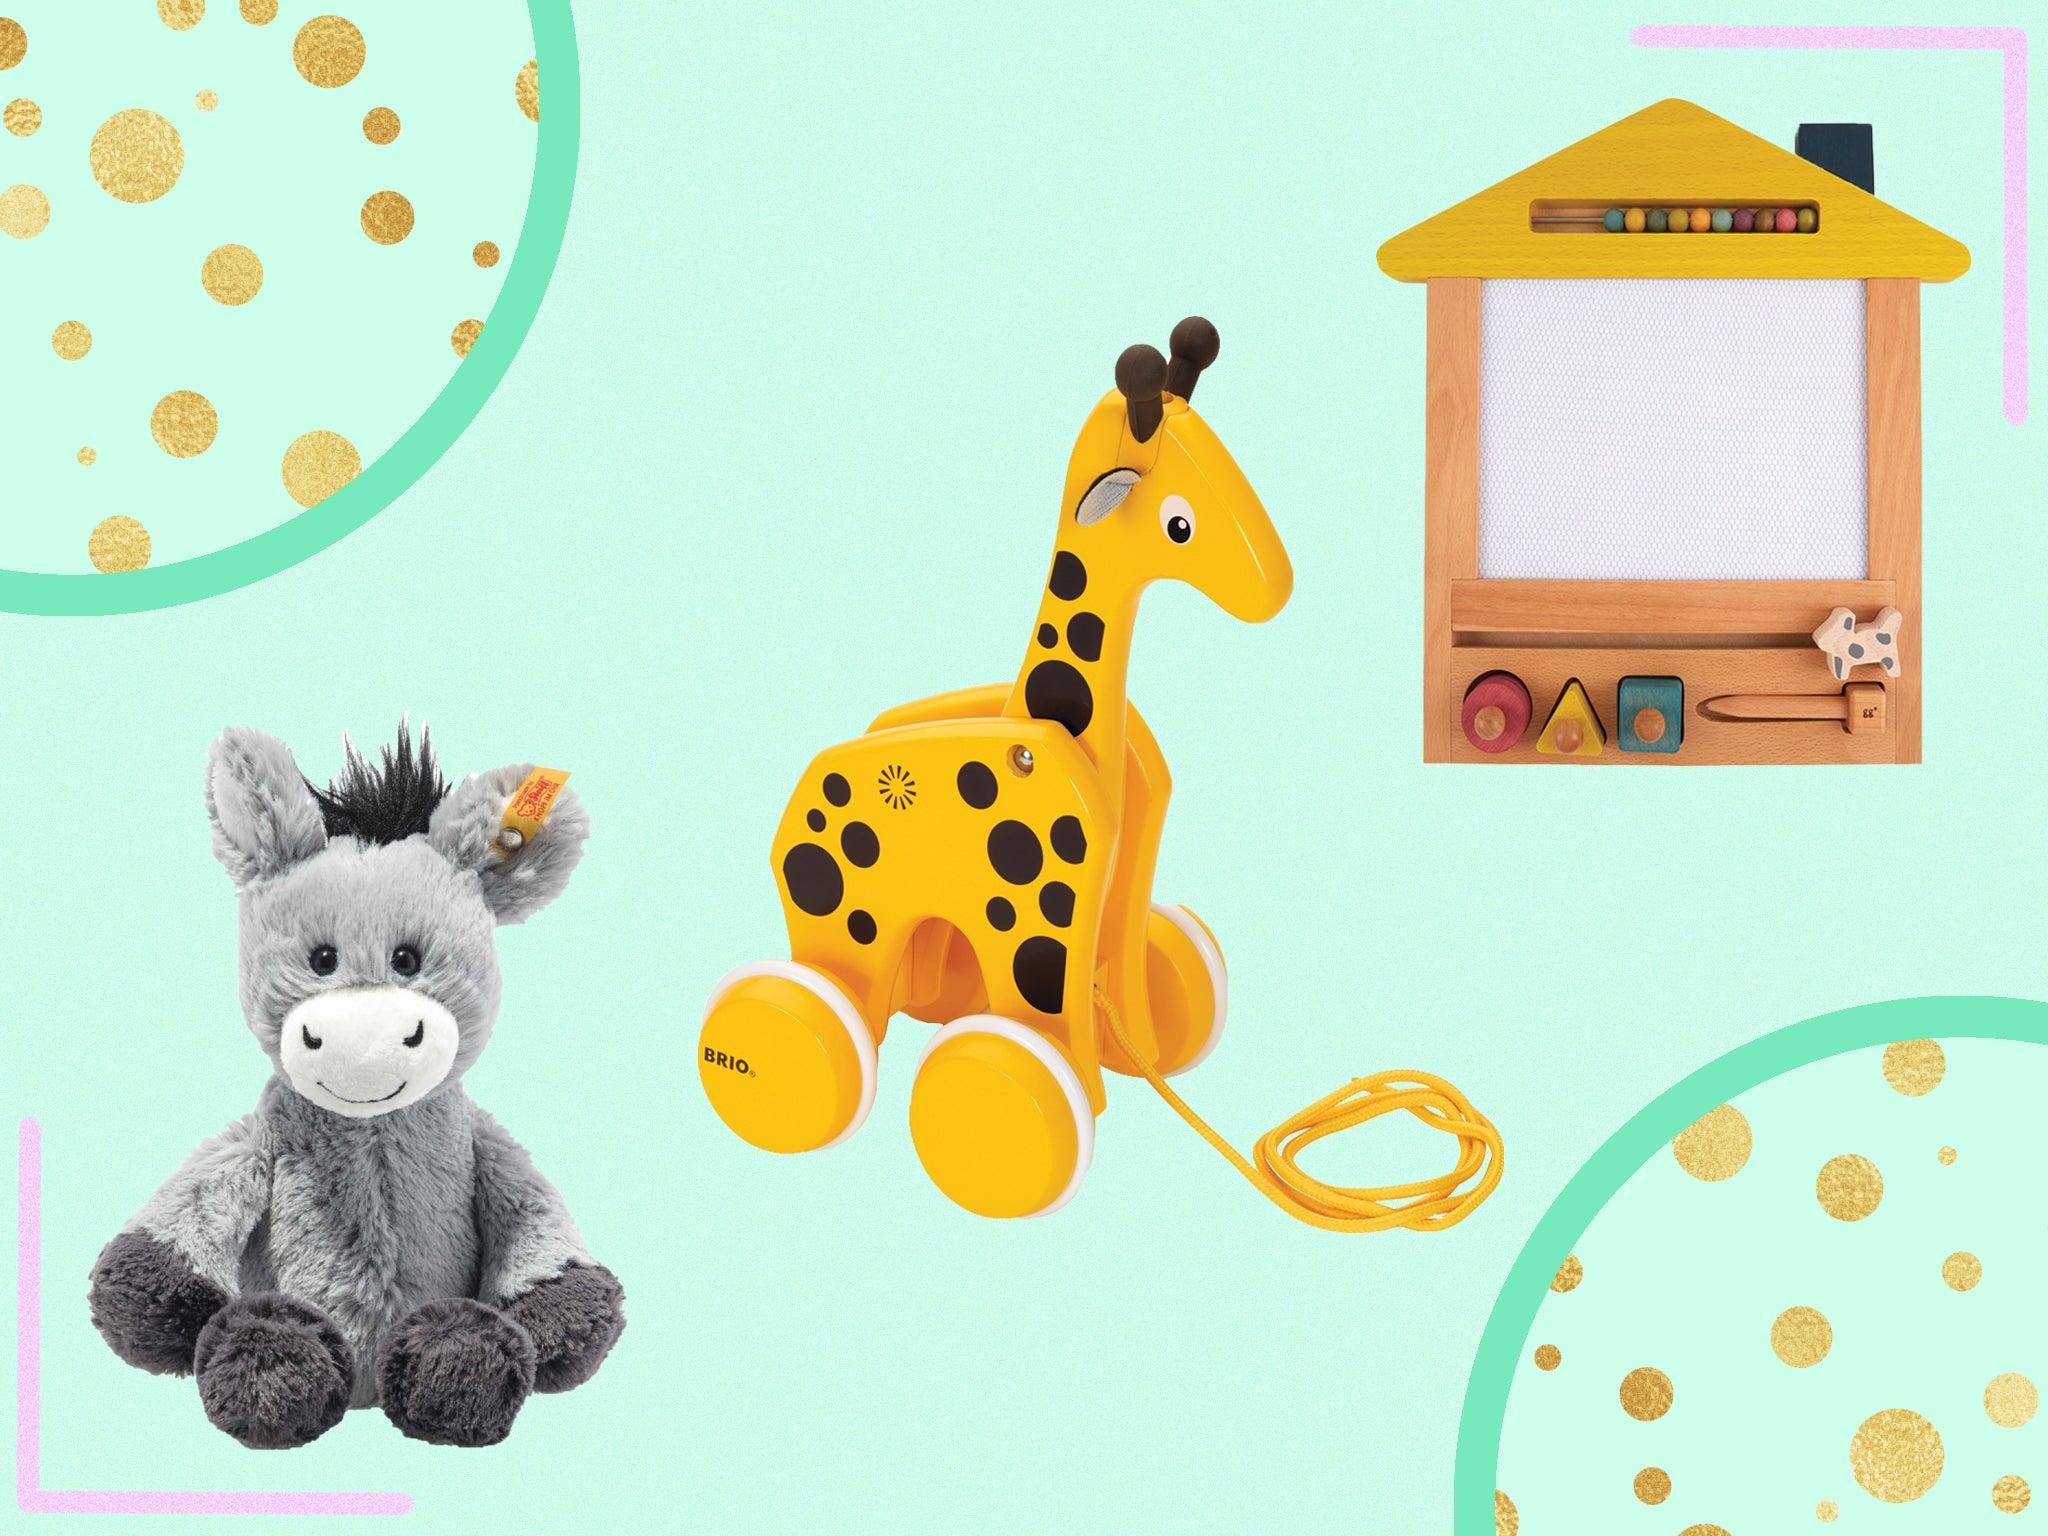 Award Winning Grey Toddler Activity Table Little Balance Box 2-in-1: No Wheels Spring Feet Girl Boy Baby Walker Push Stand Toys